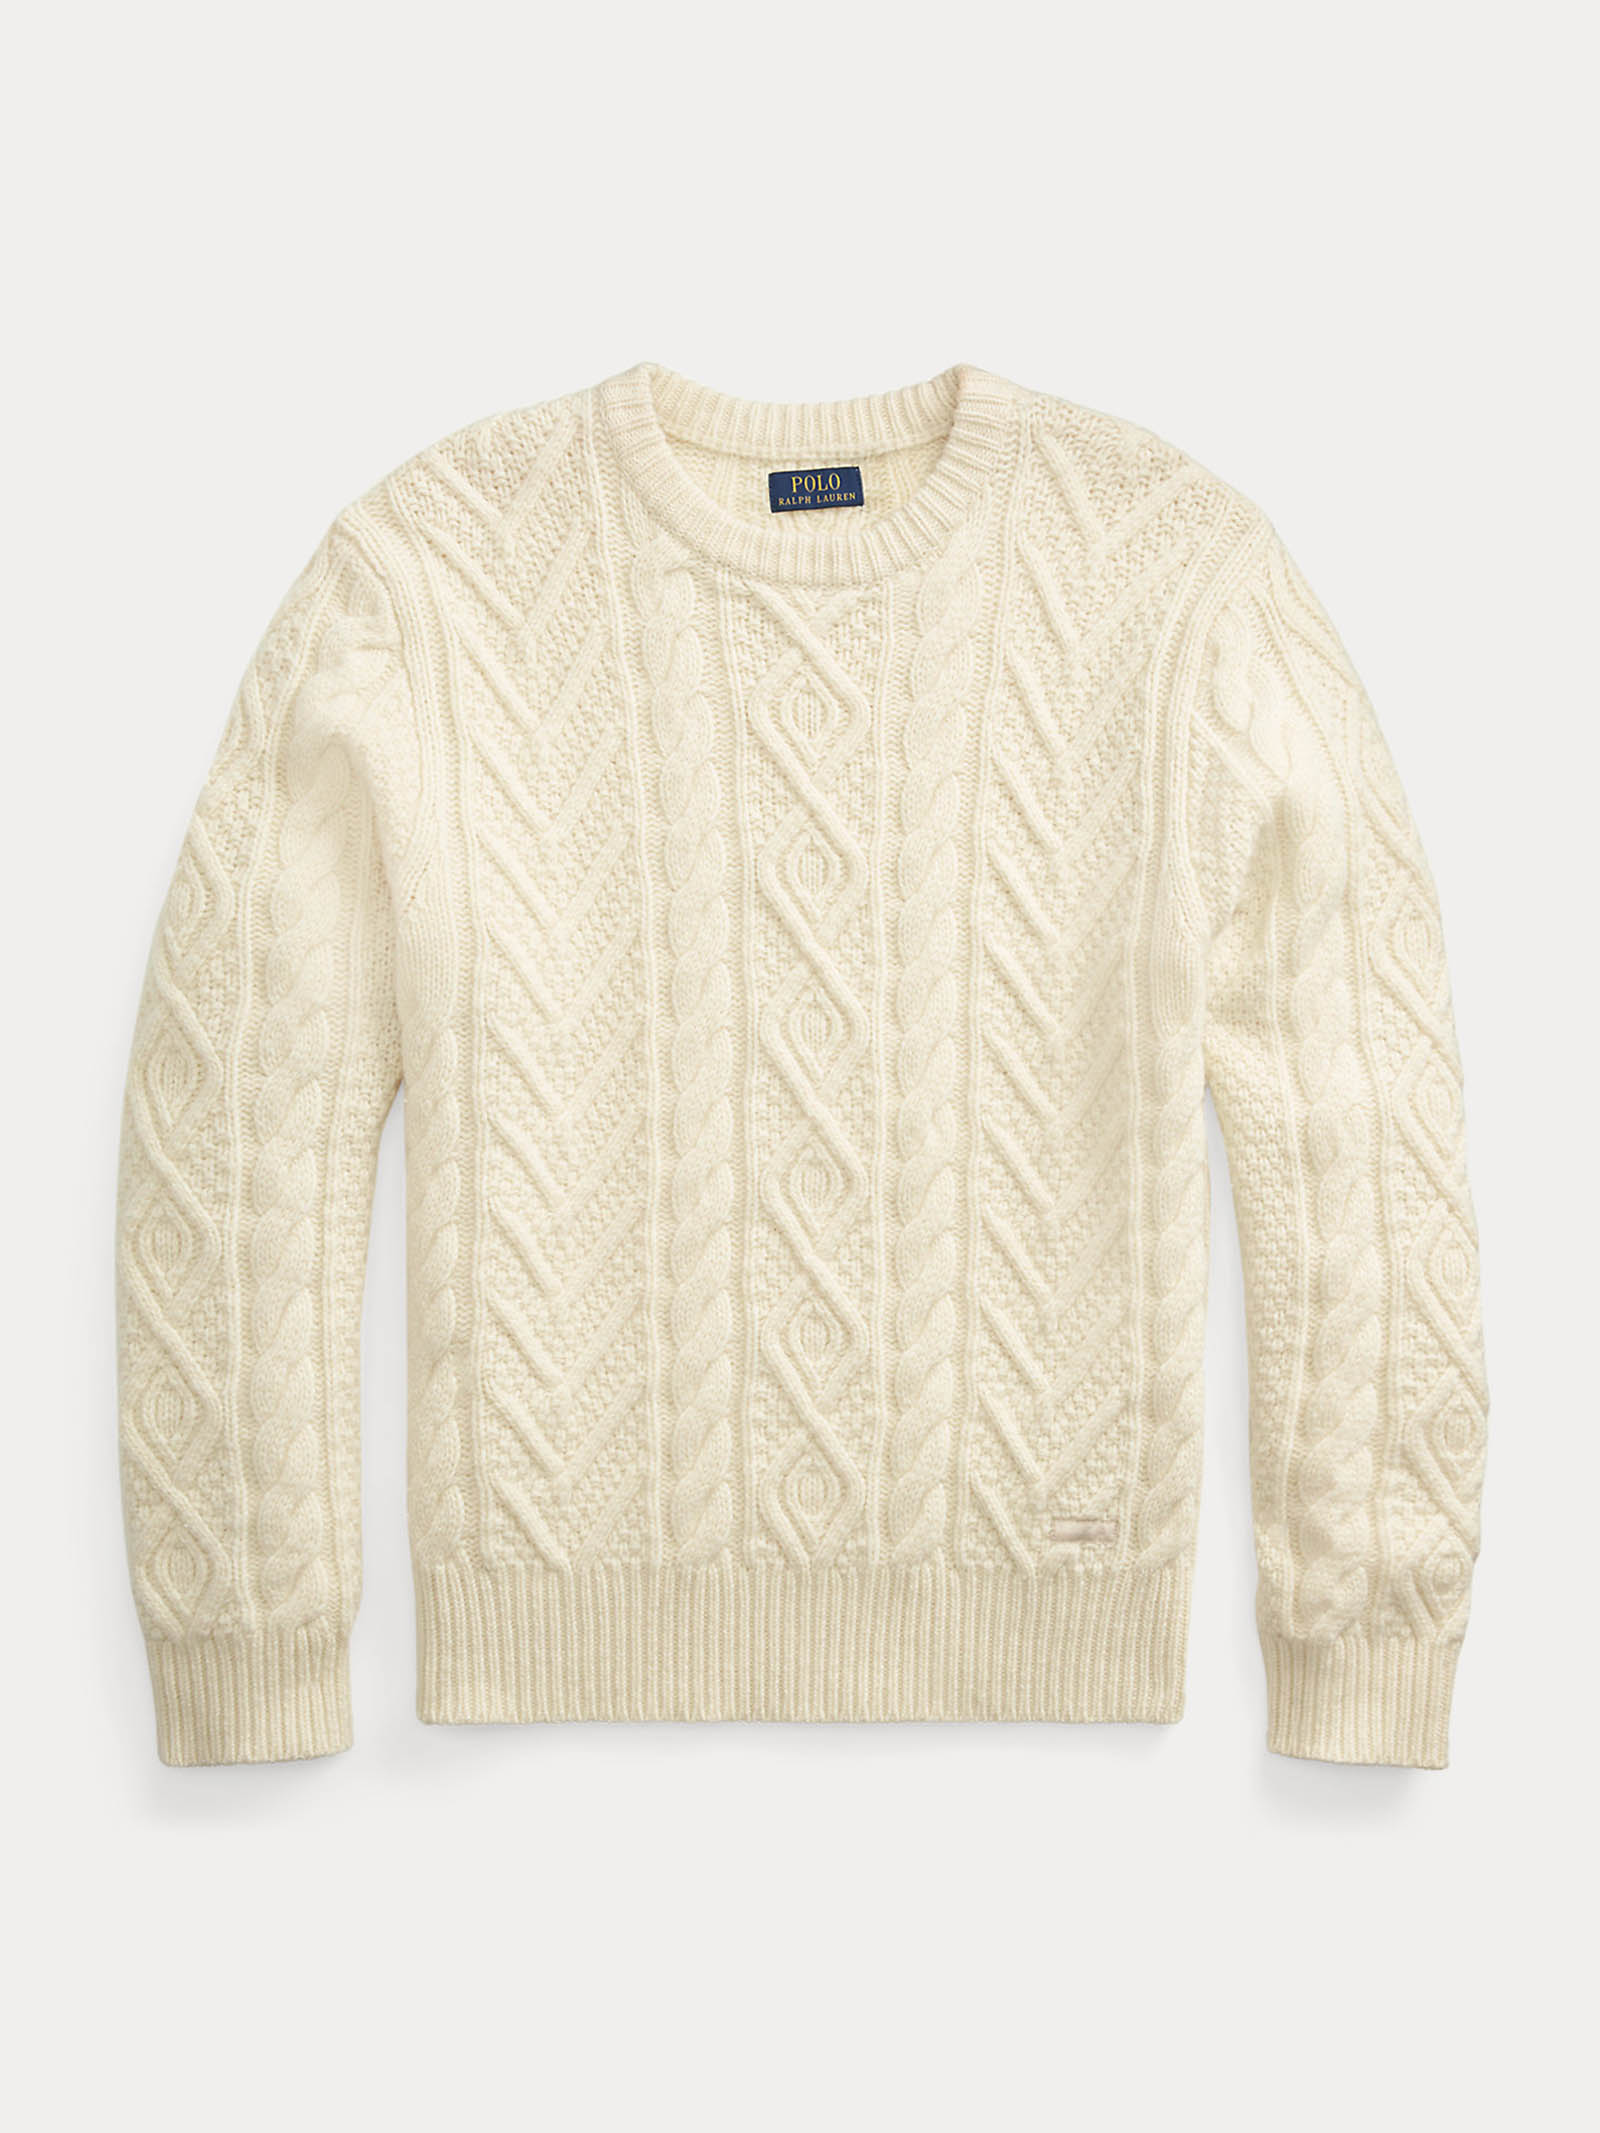 Maglia in lana e cashmere a punto Aran RALPH LAUREN | Maglia | 710-813349002